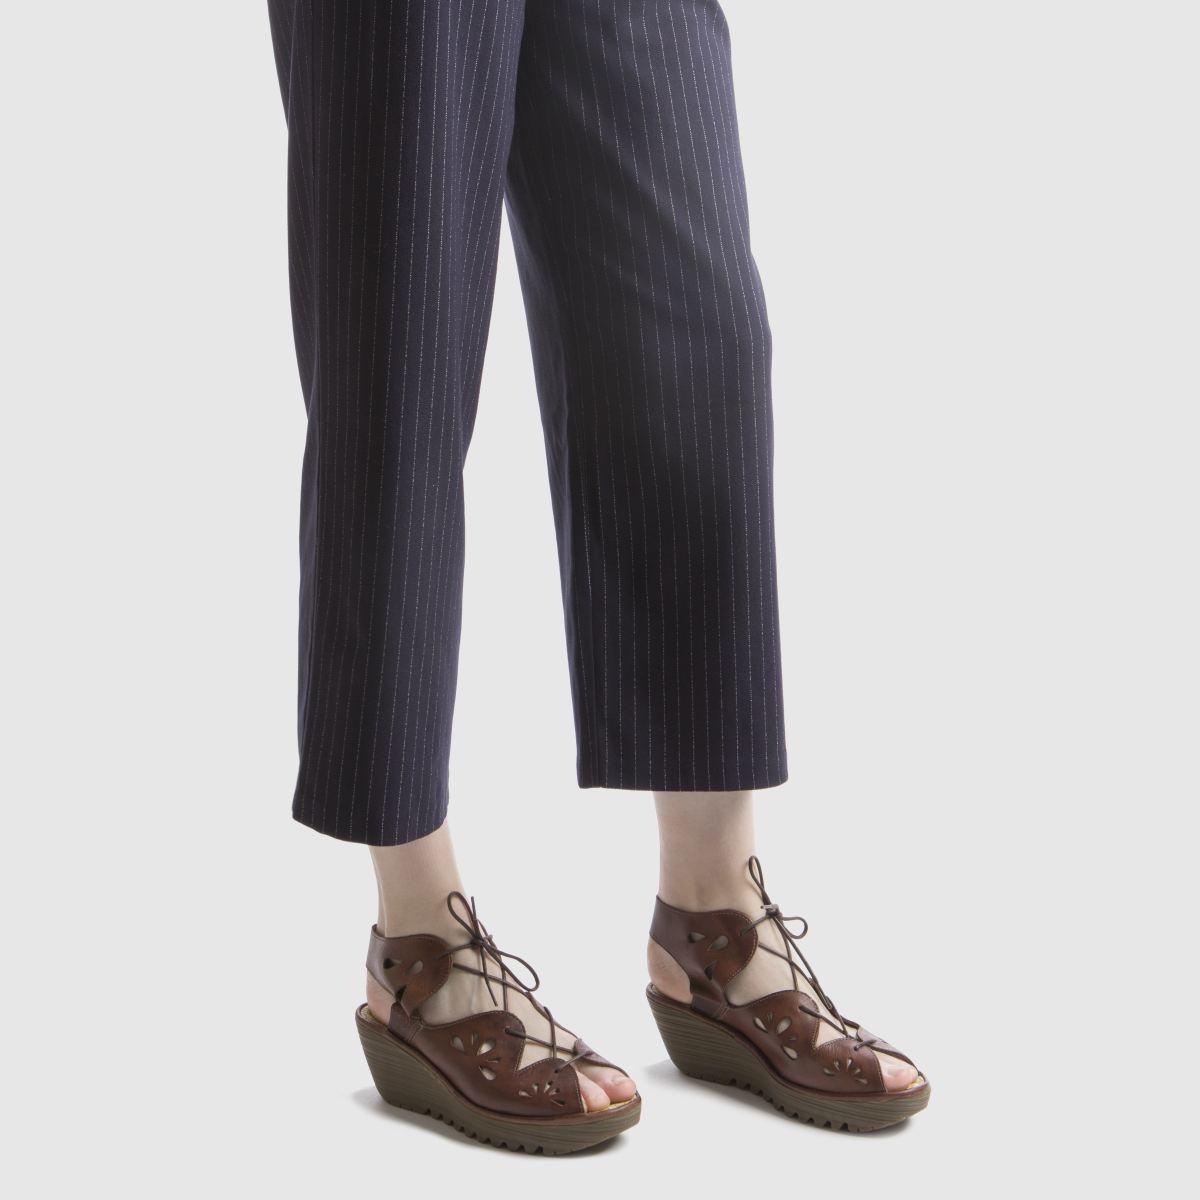 Damen Braun fly london Yote Sandalen | Schuhe schuh Gute Qualität beliebte Schuhe | c41c4d